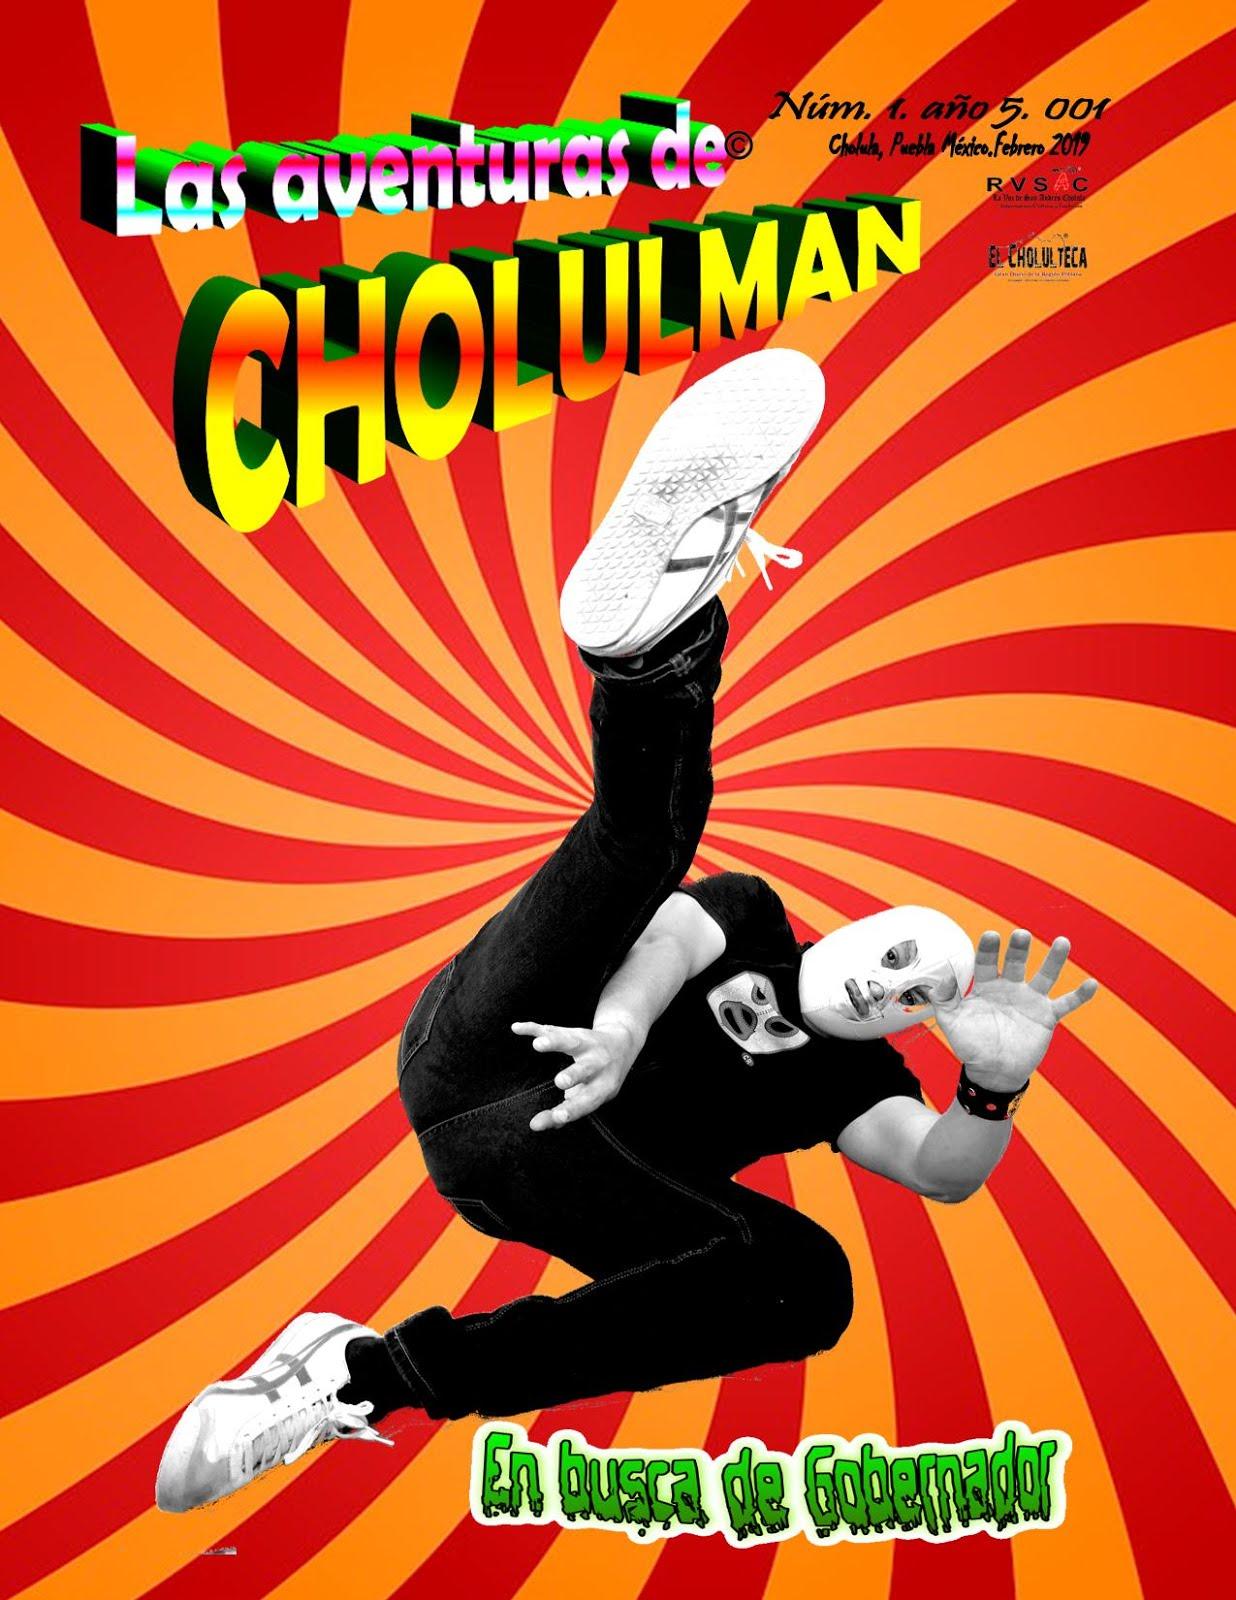 El Cholulman